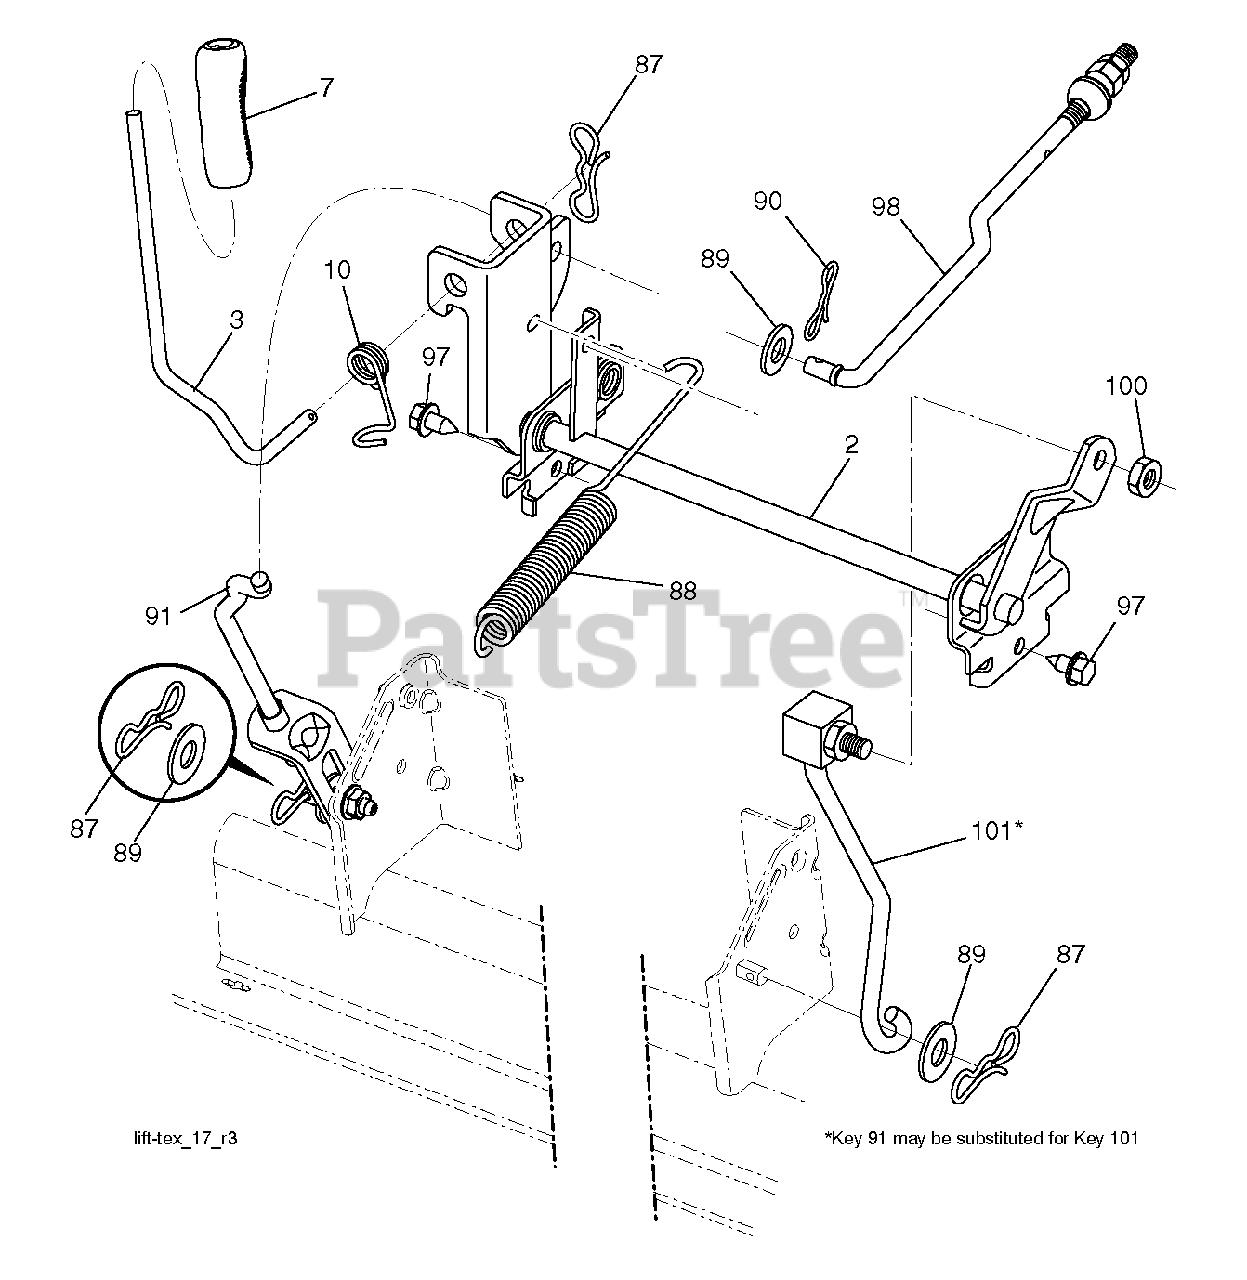 [WLLP_2054]   Husqvarna Mower Schematics - Jeep Dome Light Fuse Box for Wiring Diagram  Schematics   Husqvarna Mower Schematics      Wiring Diagram Schematics